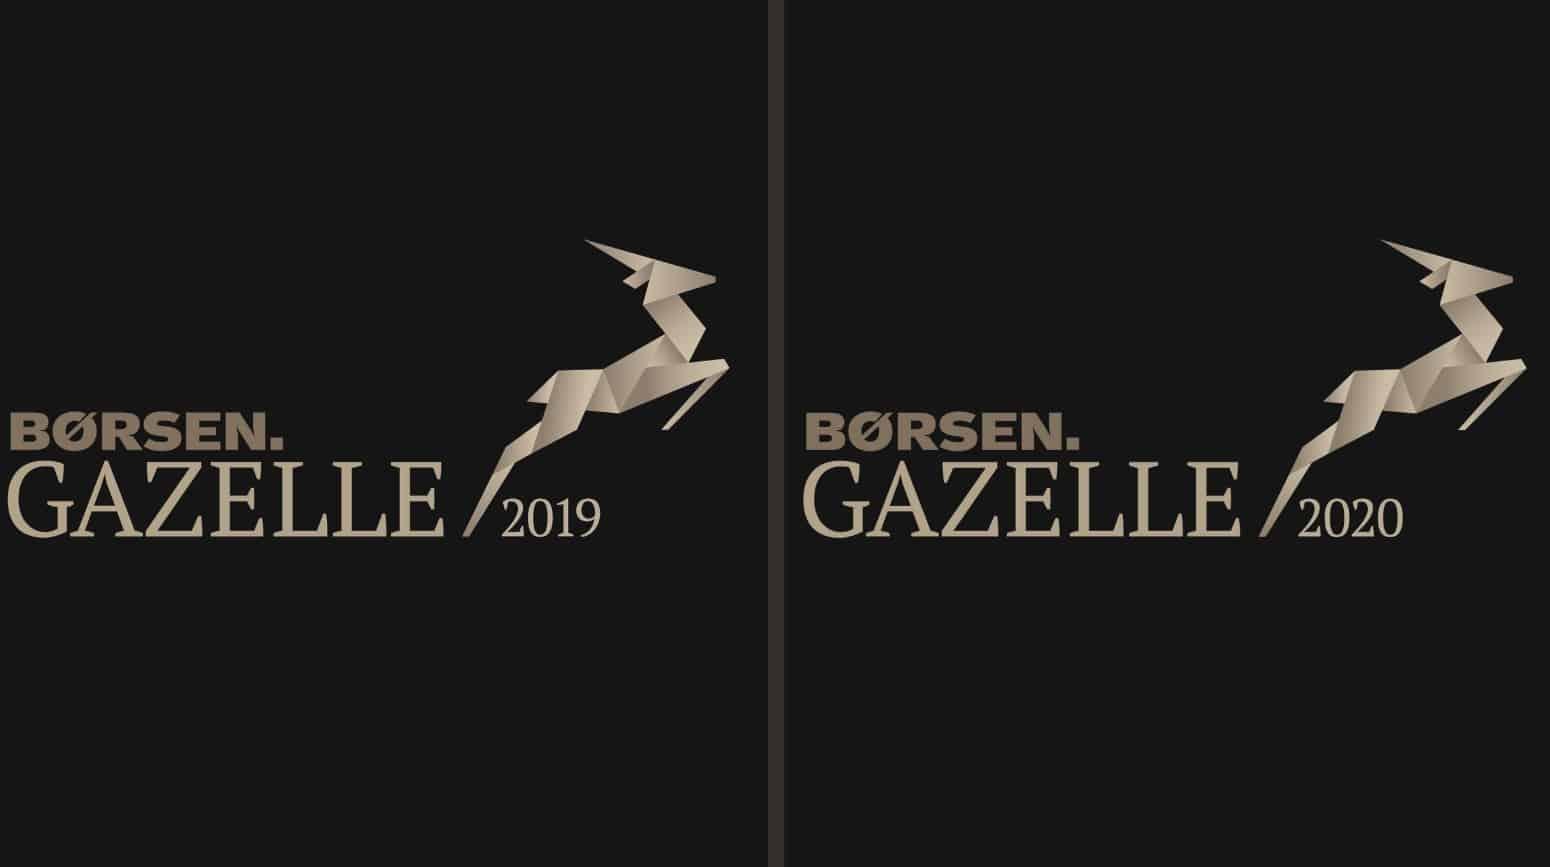 gazelle_2019-2020_kaerbygaard7